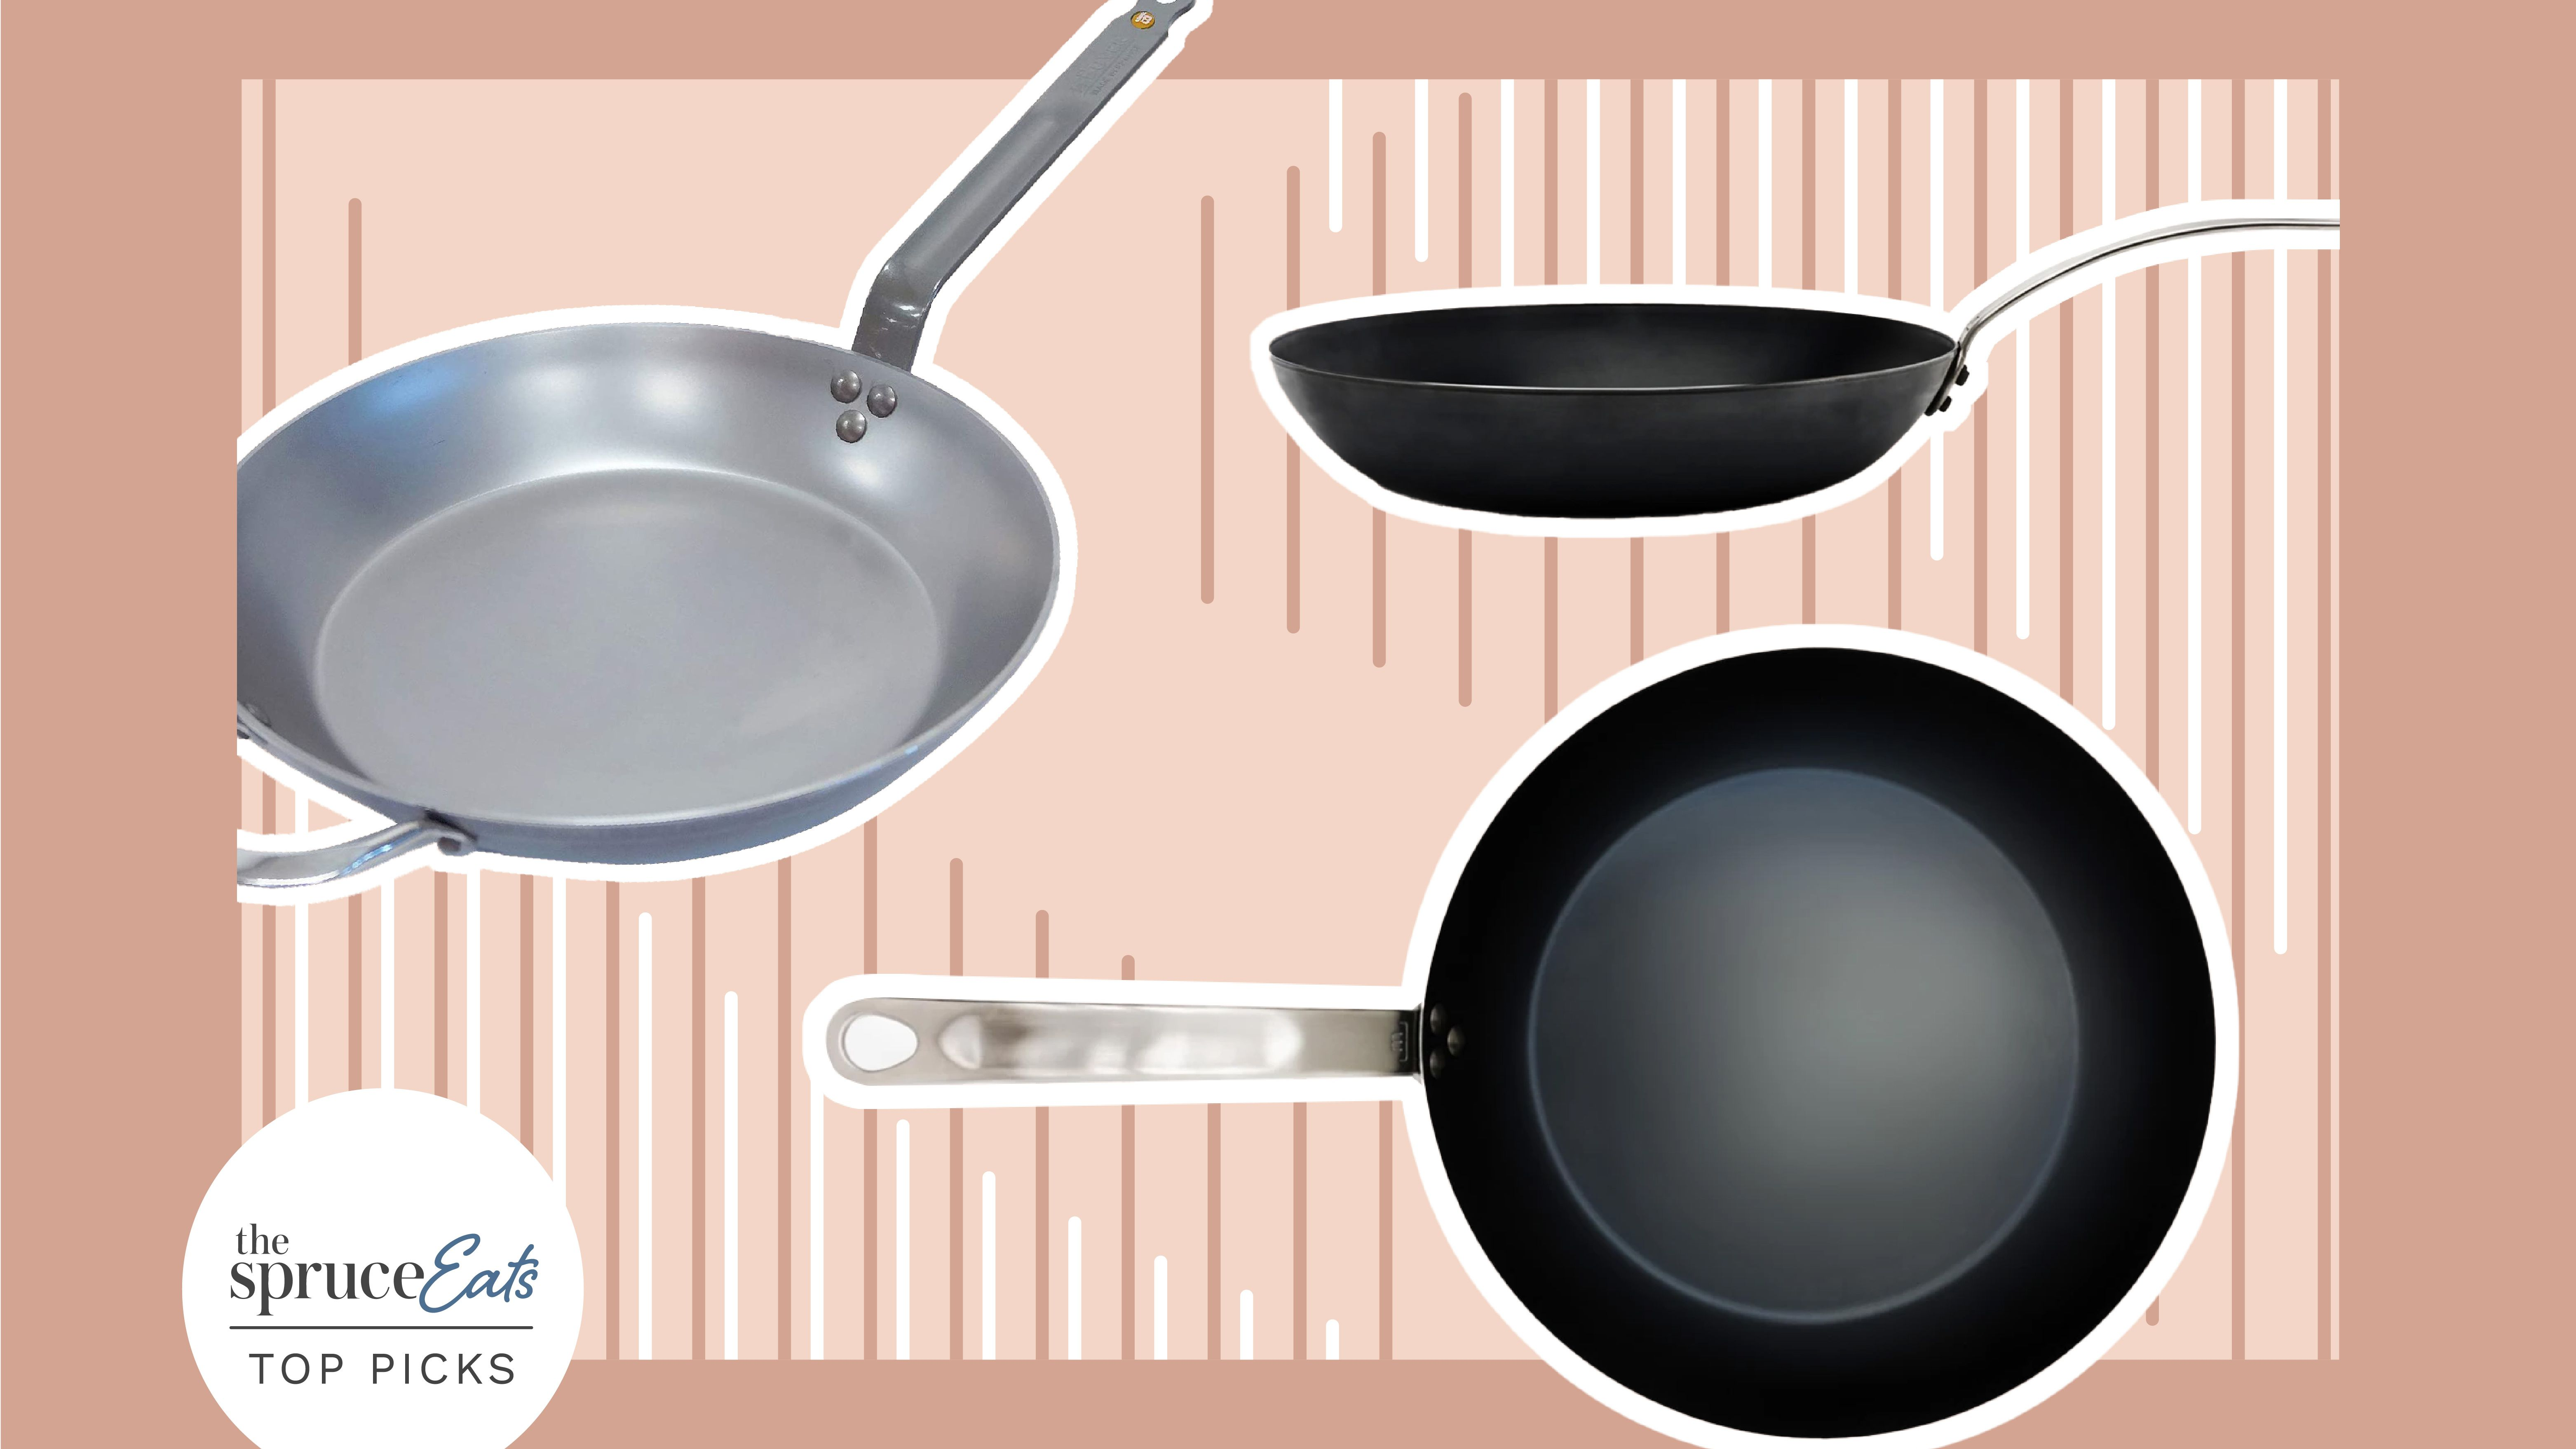 Salter BW05456BS Carbon Steel Pan for Life Pre-Seasoned Frying Pan Oven Safe Black 24 cm